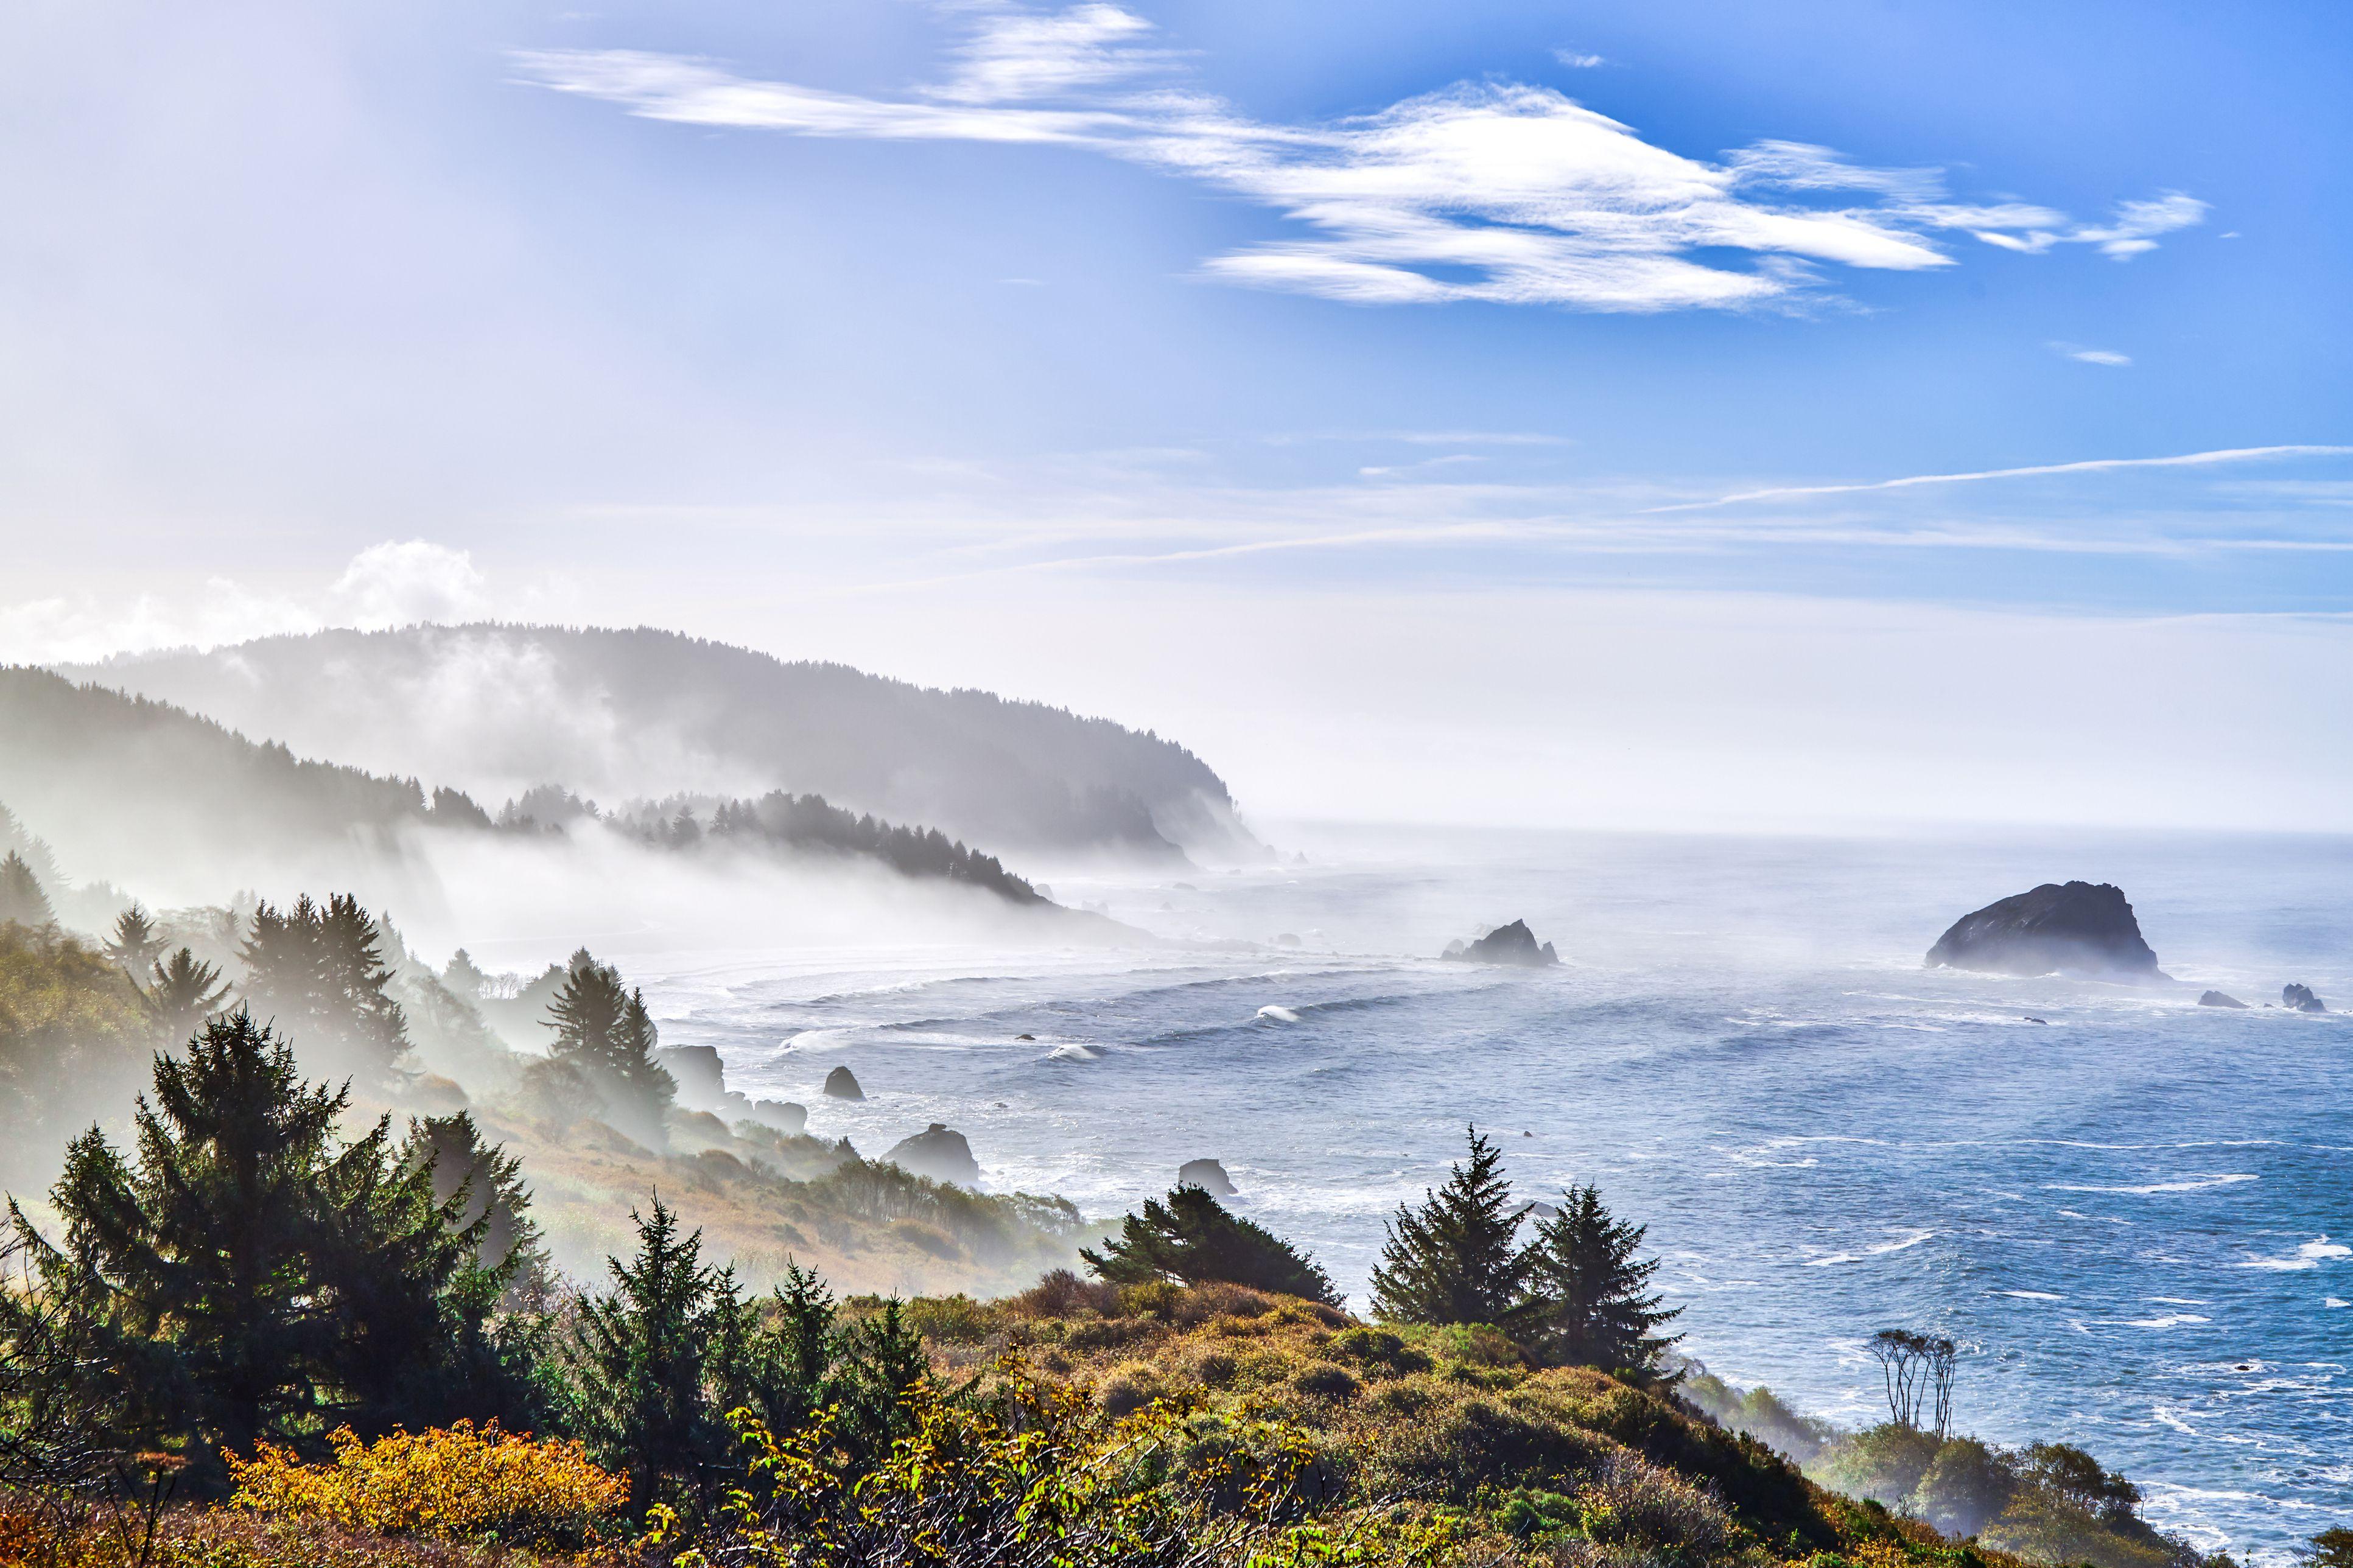 California Coastal road near Redwood National Park.